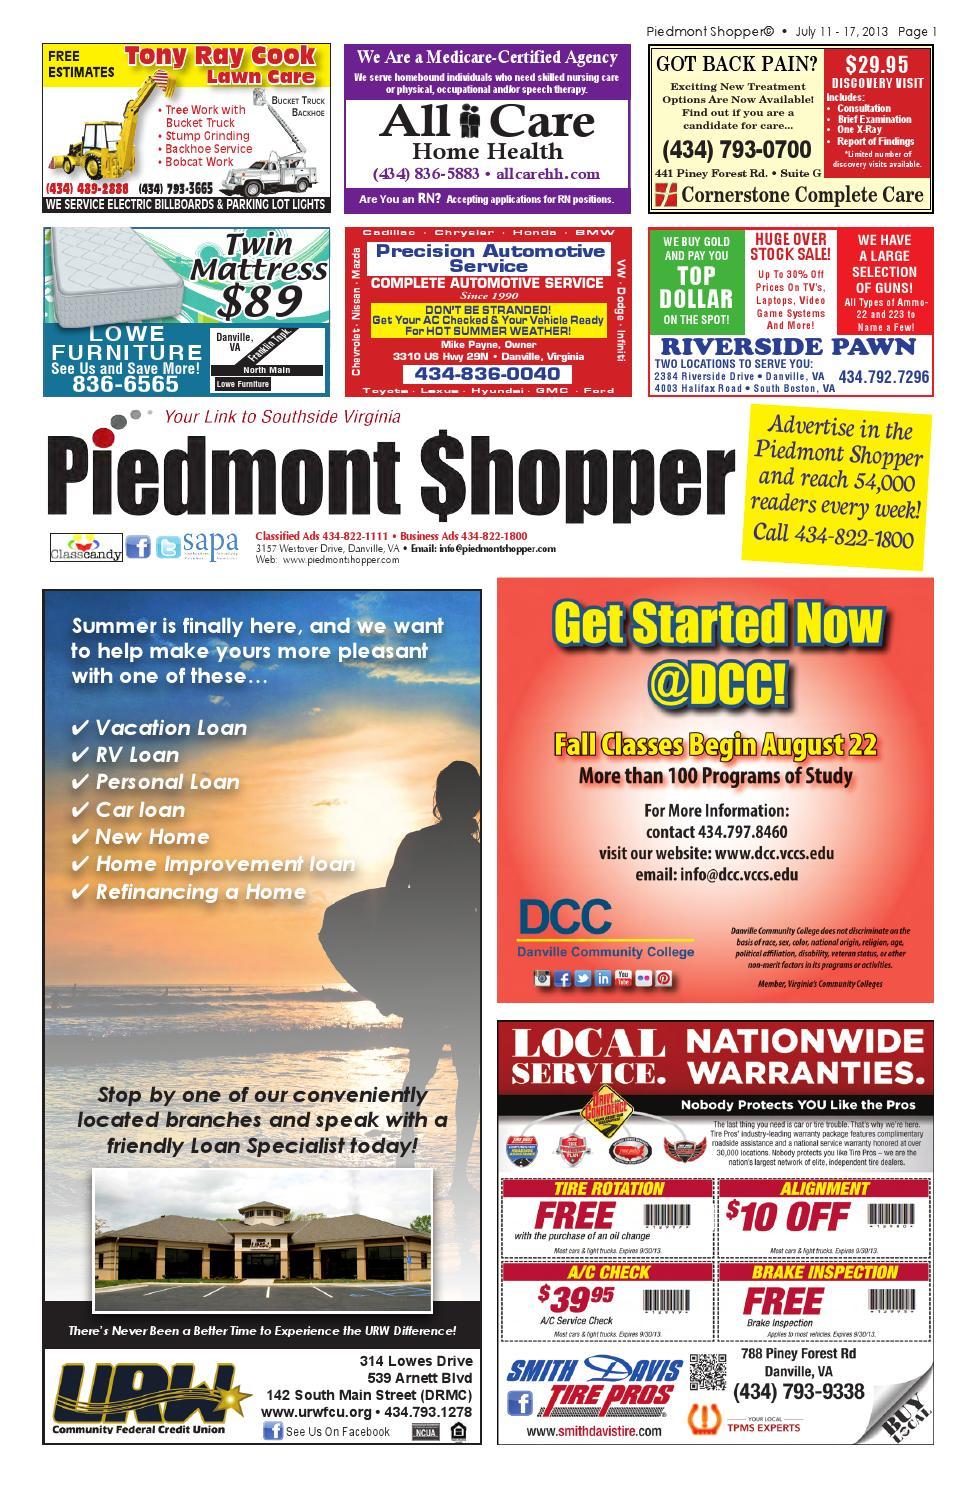 Piedmont Shopper 07 11 13 by piedmont shopper - issuu